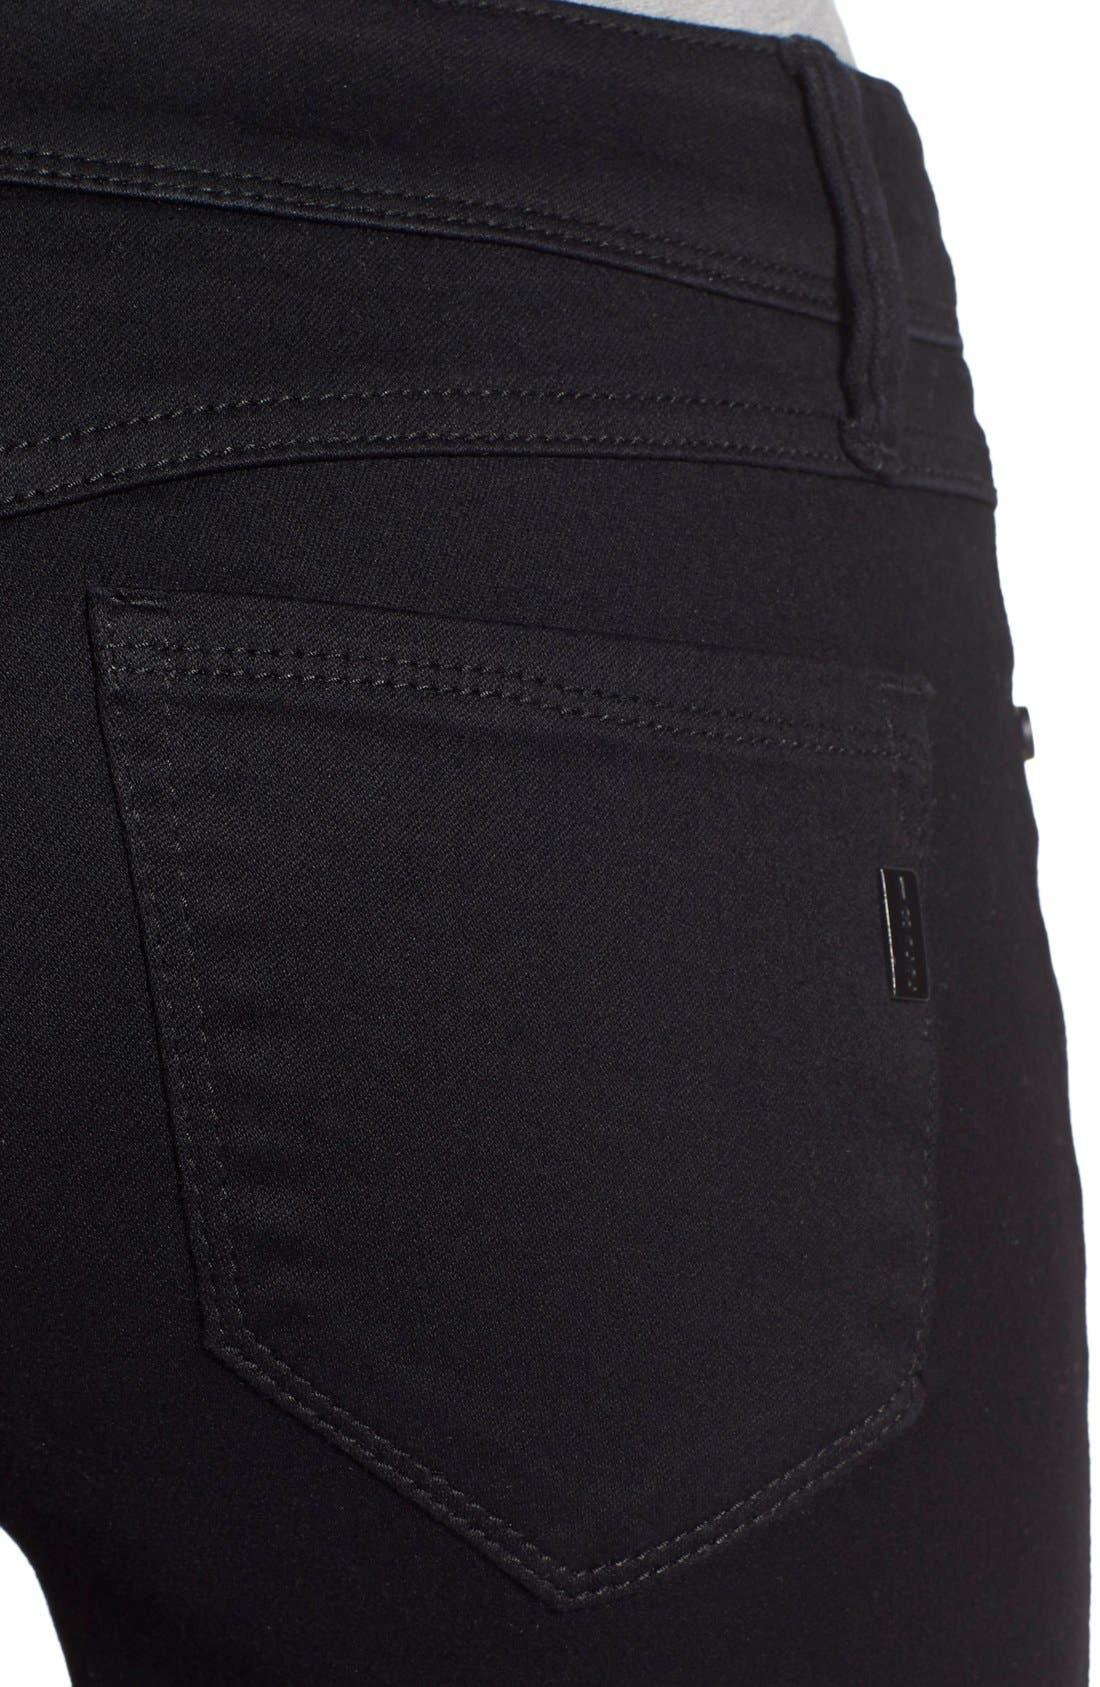 Butter Skinny Jeans,                             Alternate thumbnail 4, color,                             Black